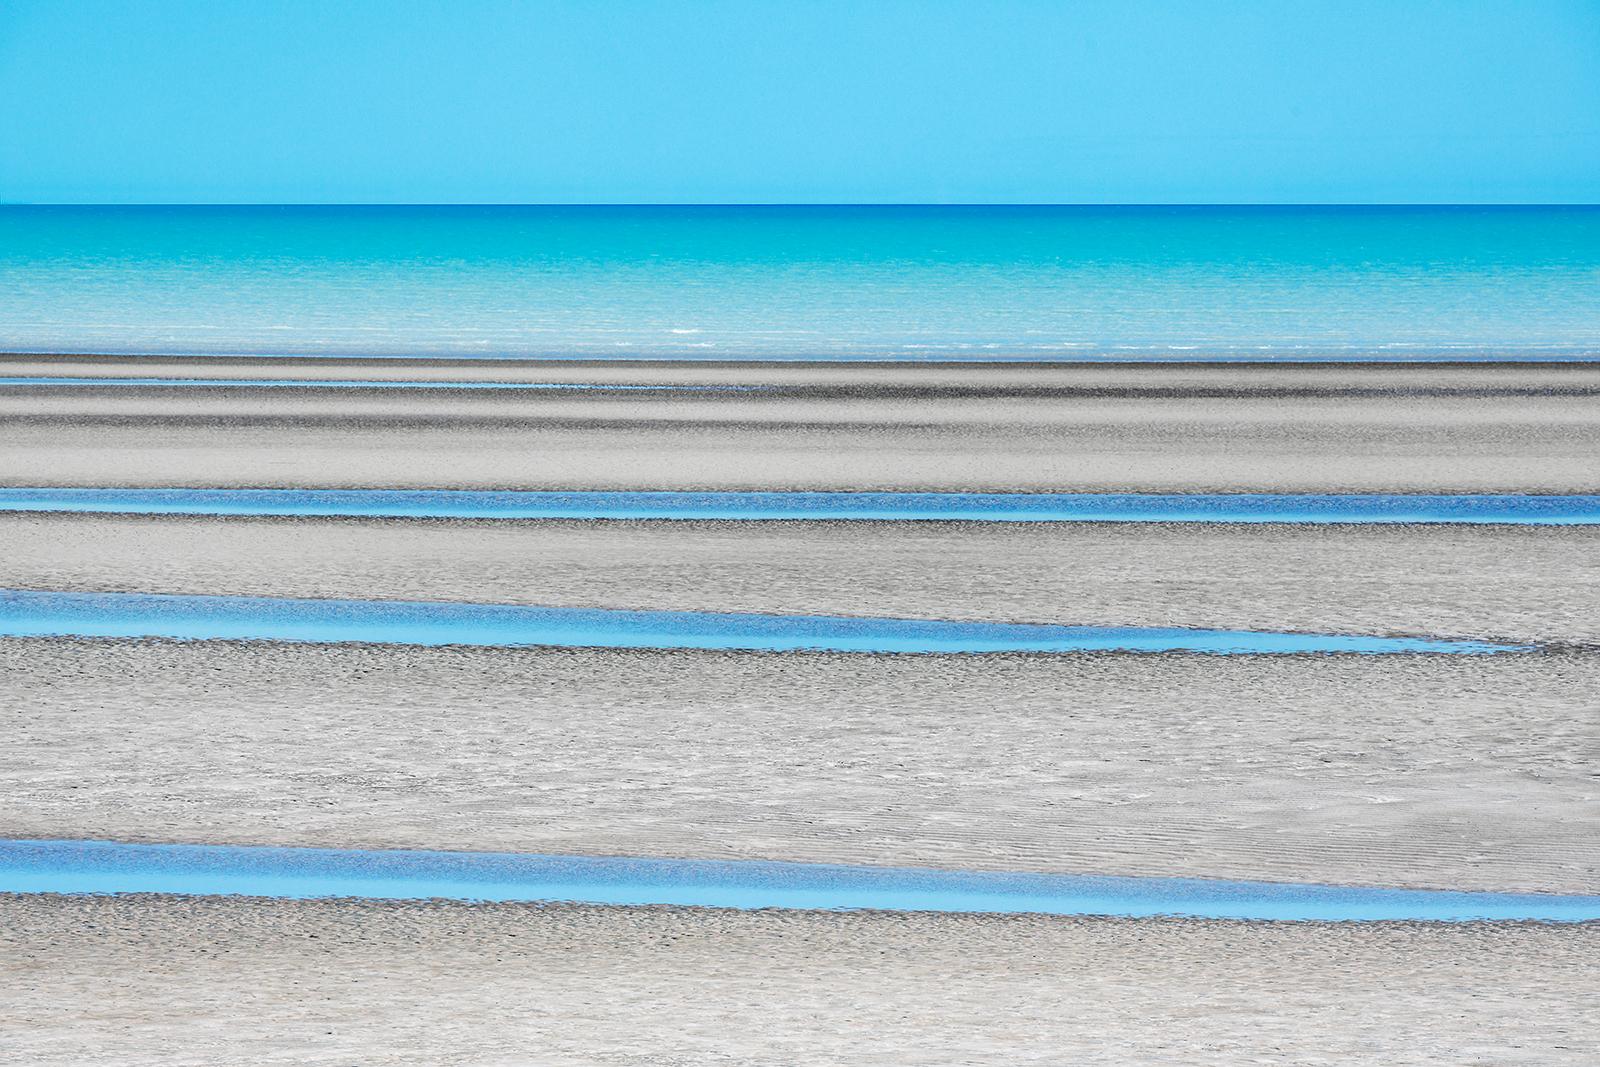 Low Tide, Pardoo Station, Pilbara Region